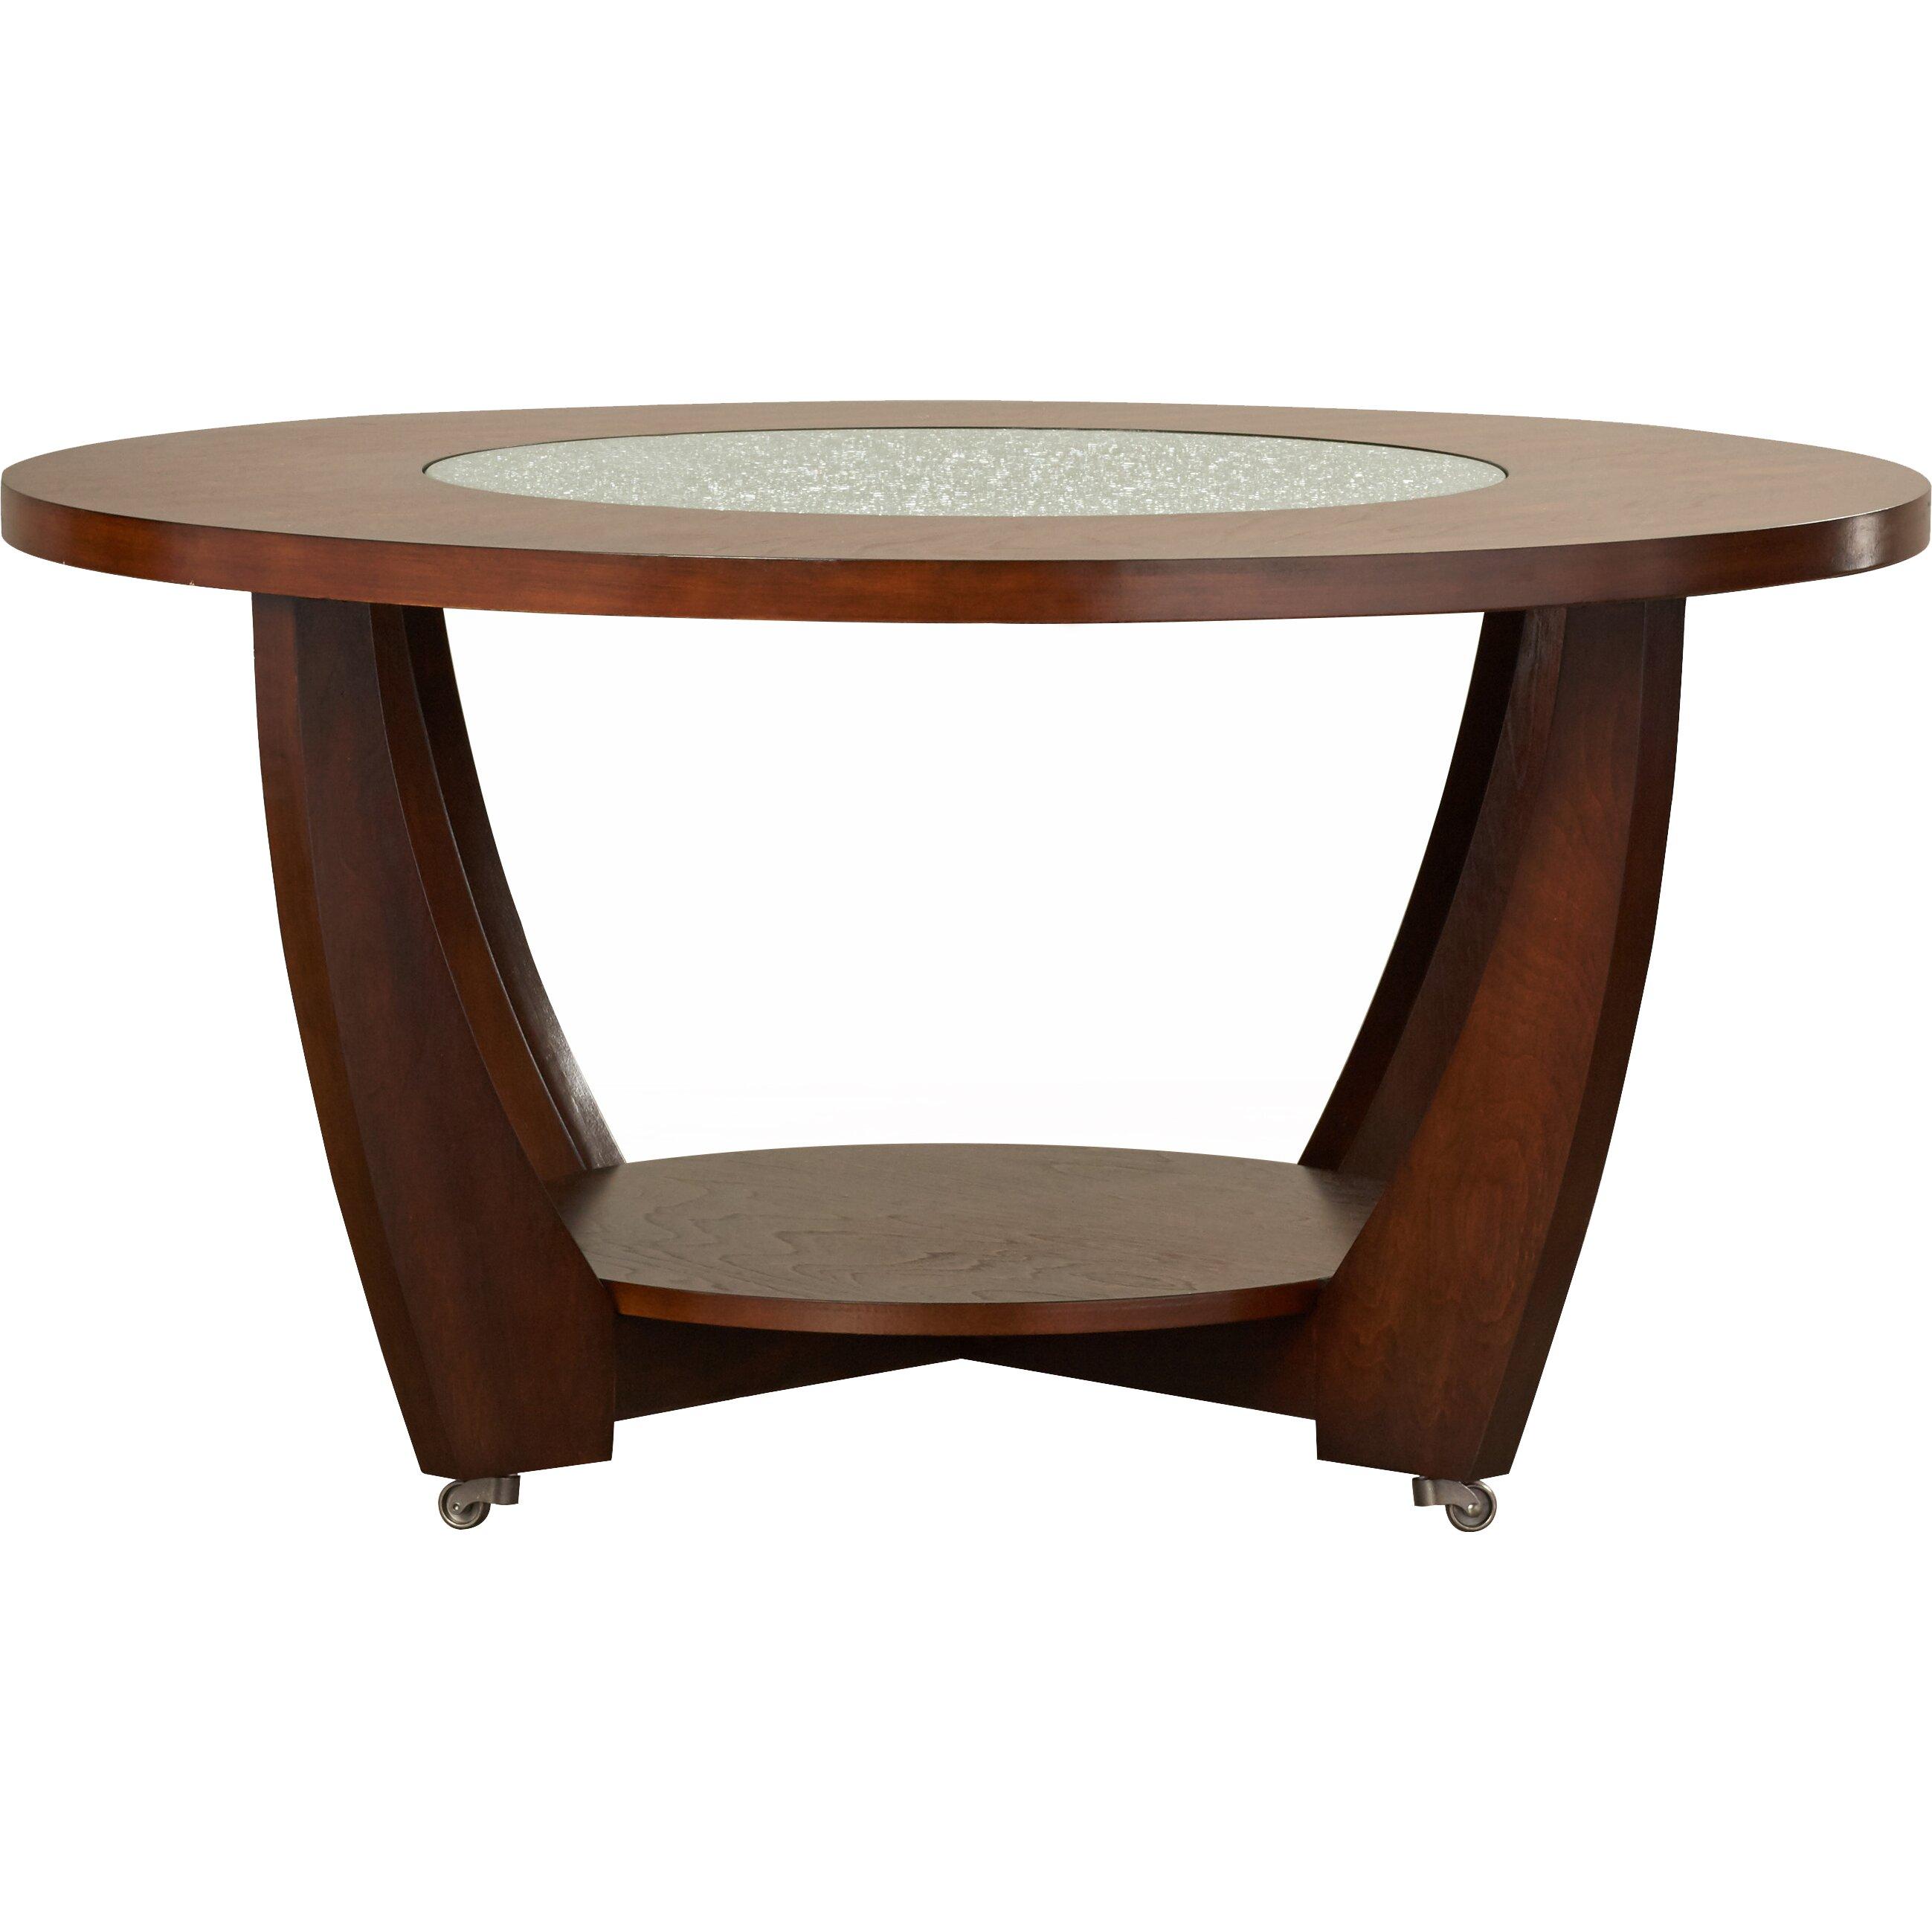 Brayden Studio Mcwhorter Dining Table Reviews: Brayden Studio Thurmont Coffee Table & Reviews